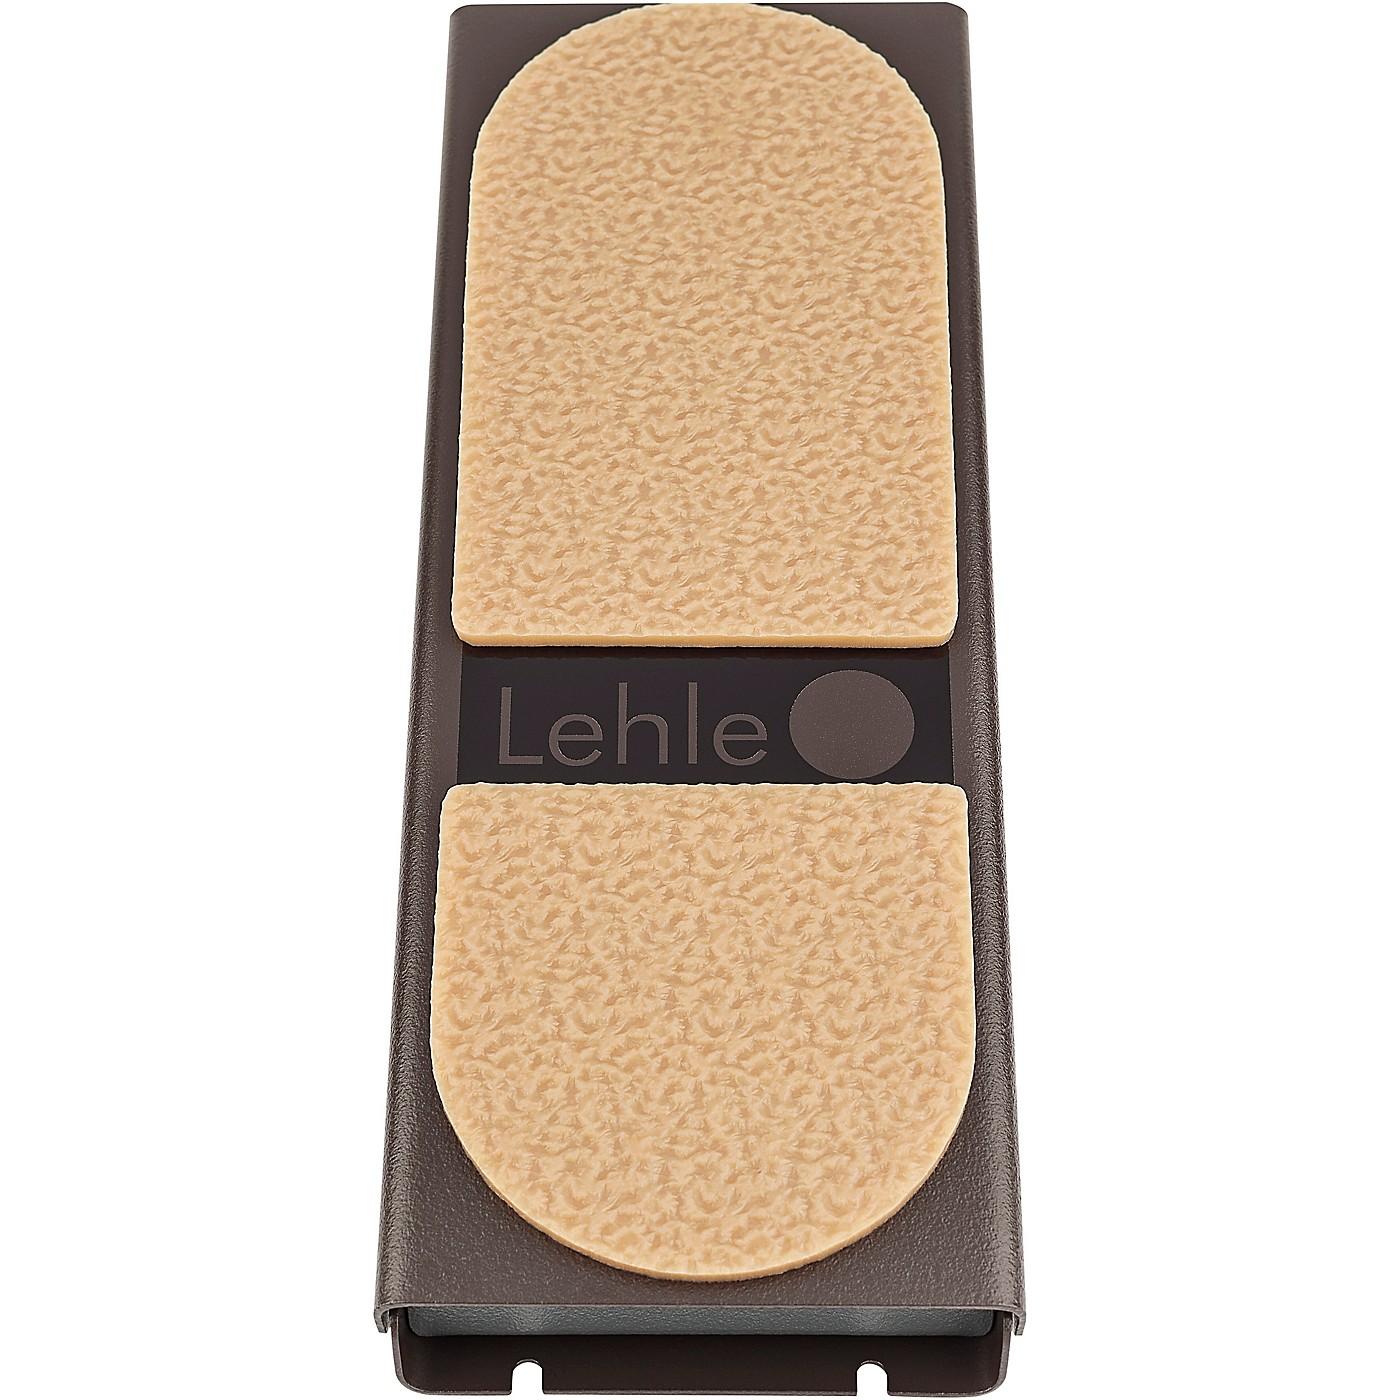 Lehle Stereo Volume Pedal - Active thumbnail